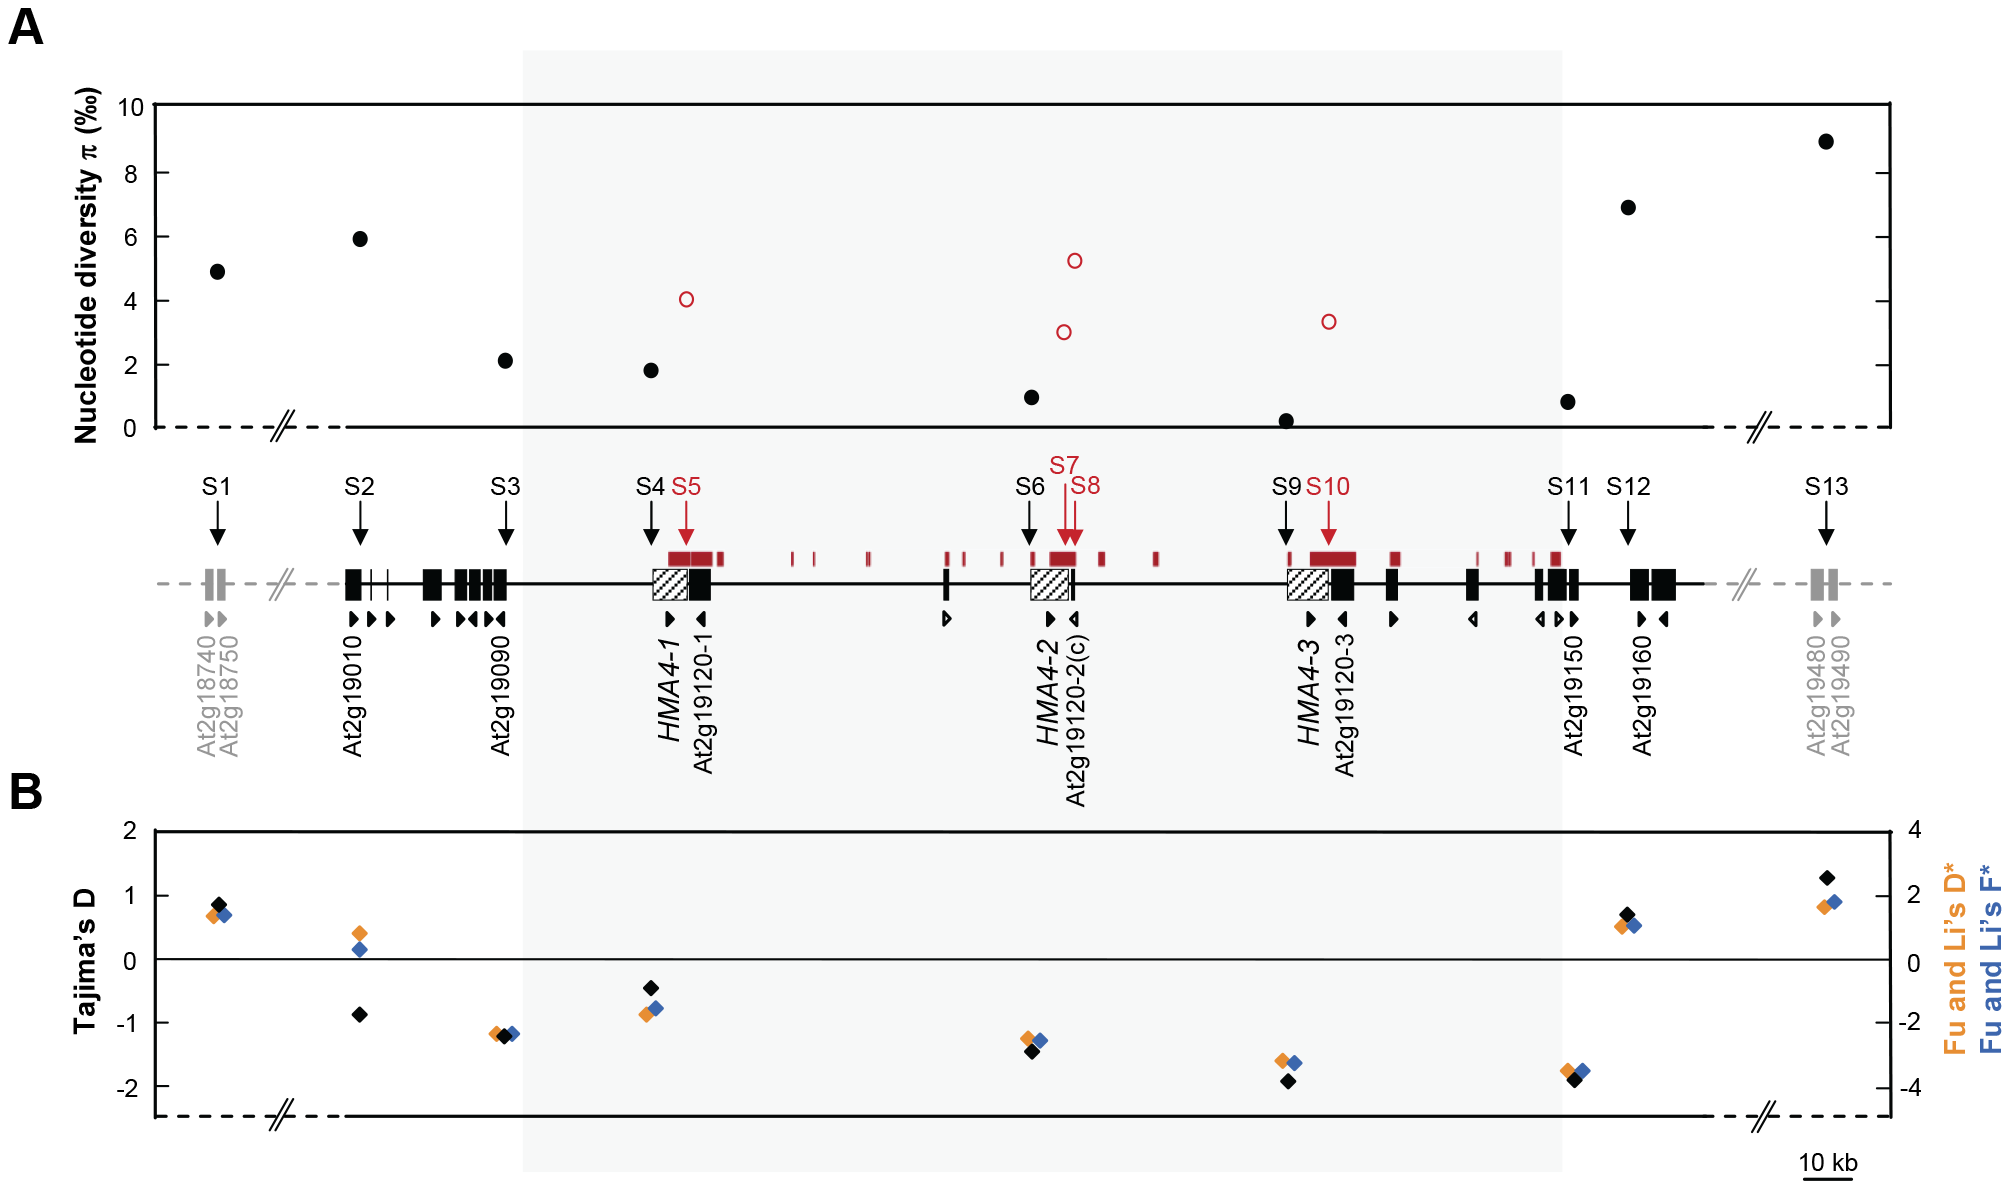 Nucleotide sequence diversity across the <i>HMA4</i> genomic region in <i>A. halleri</i>.